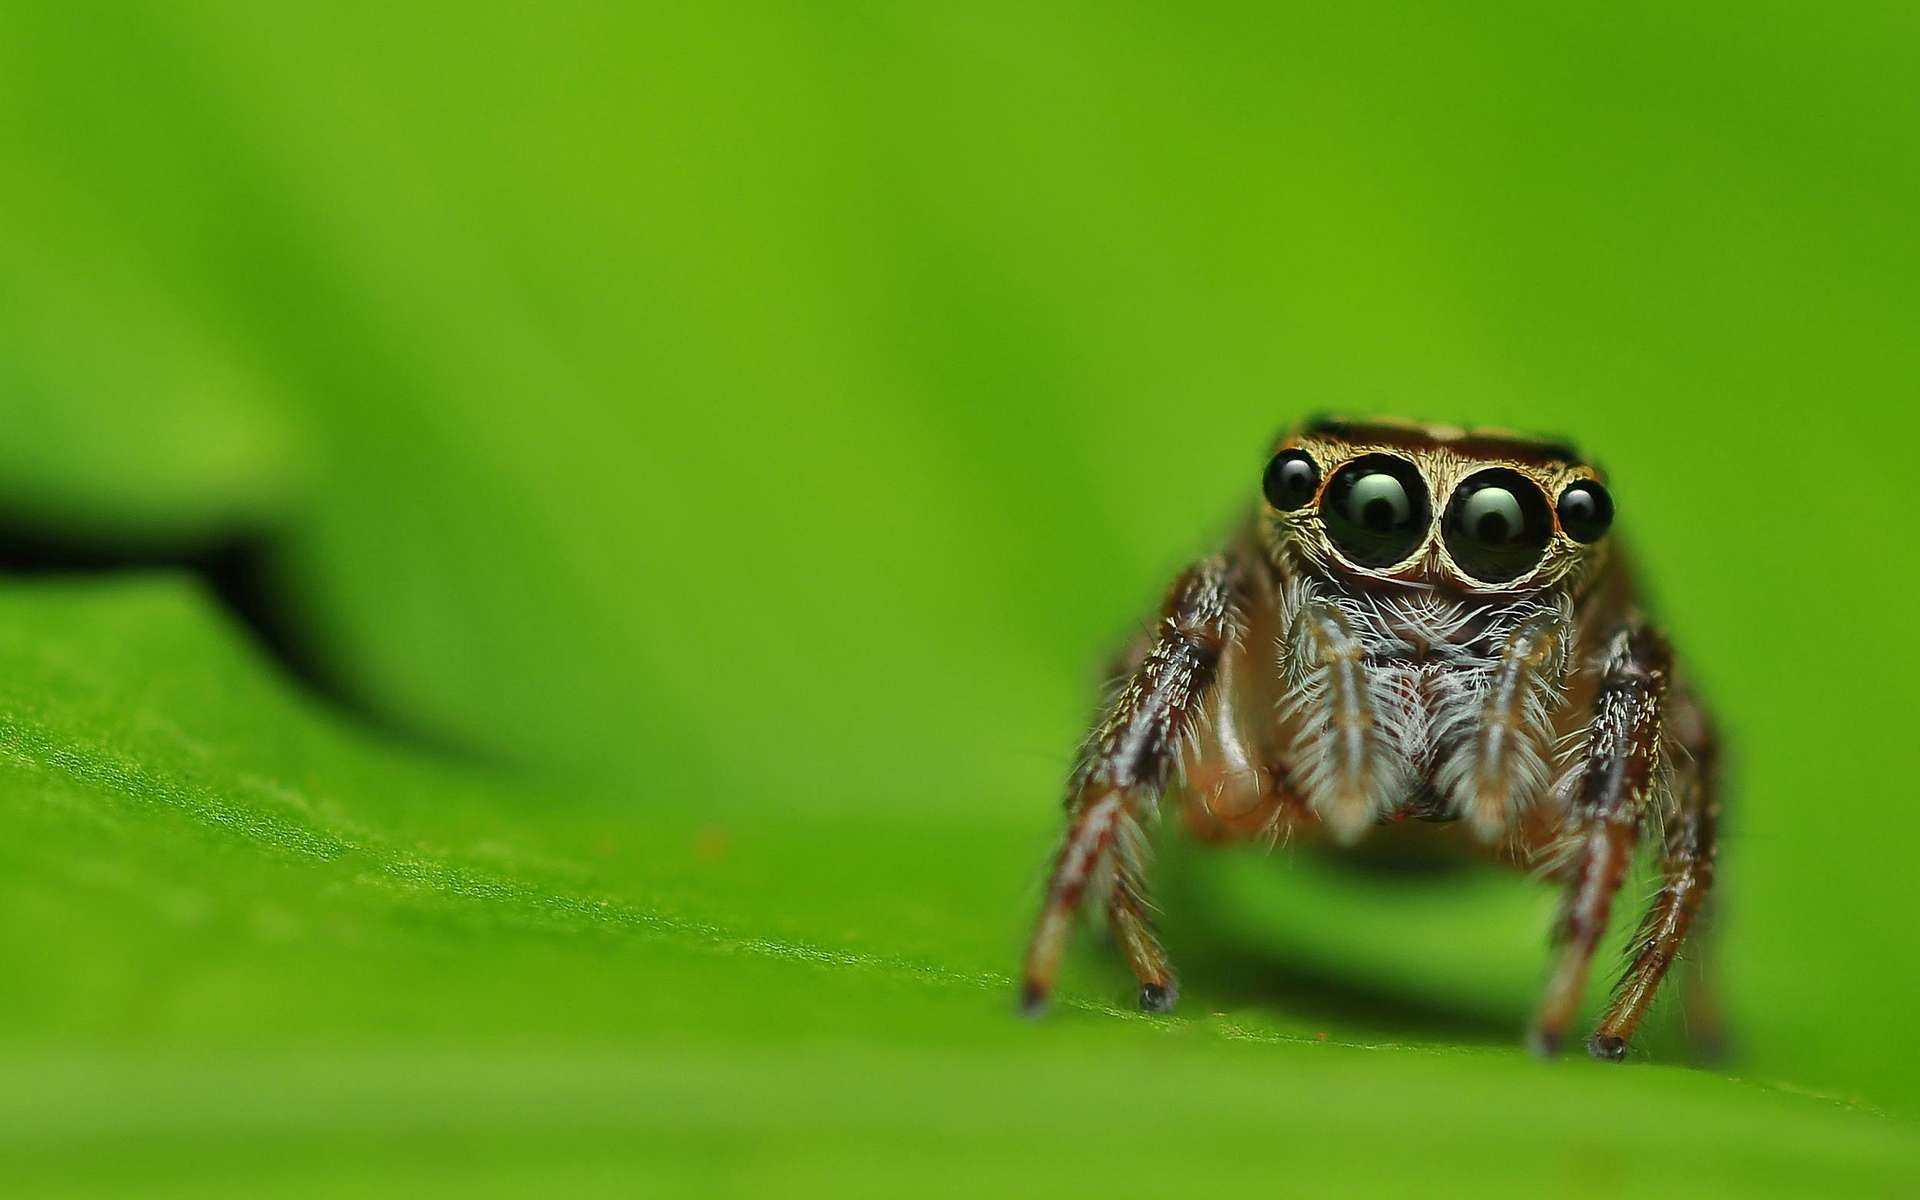 природа животные паук  № 2544282 без смс